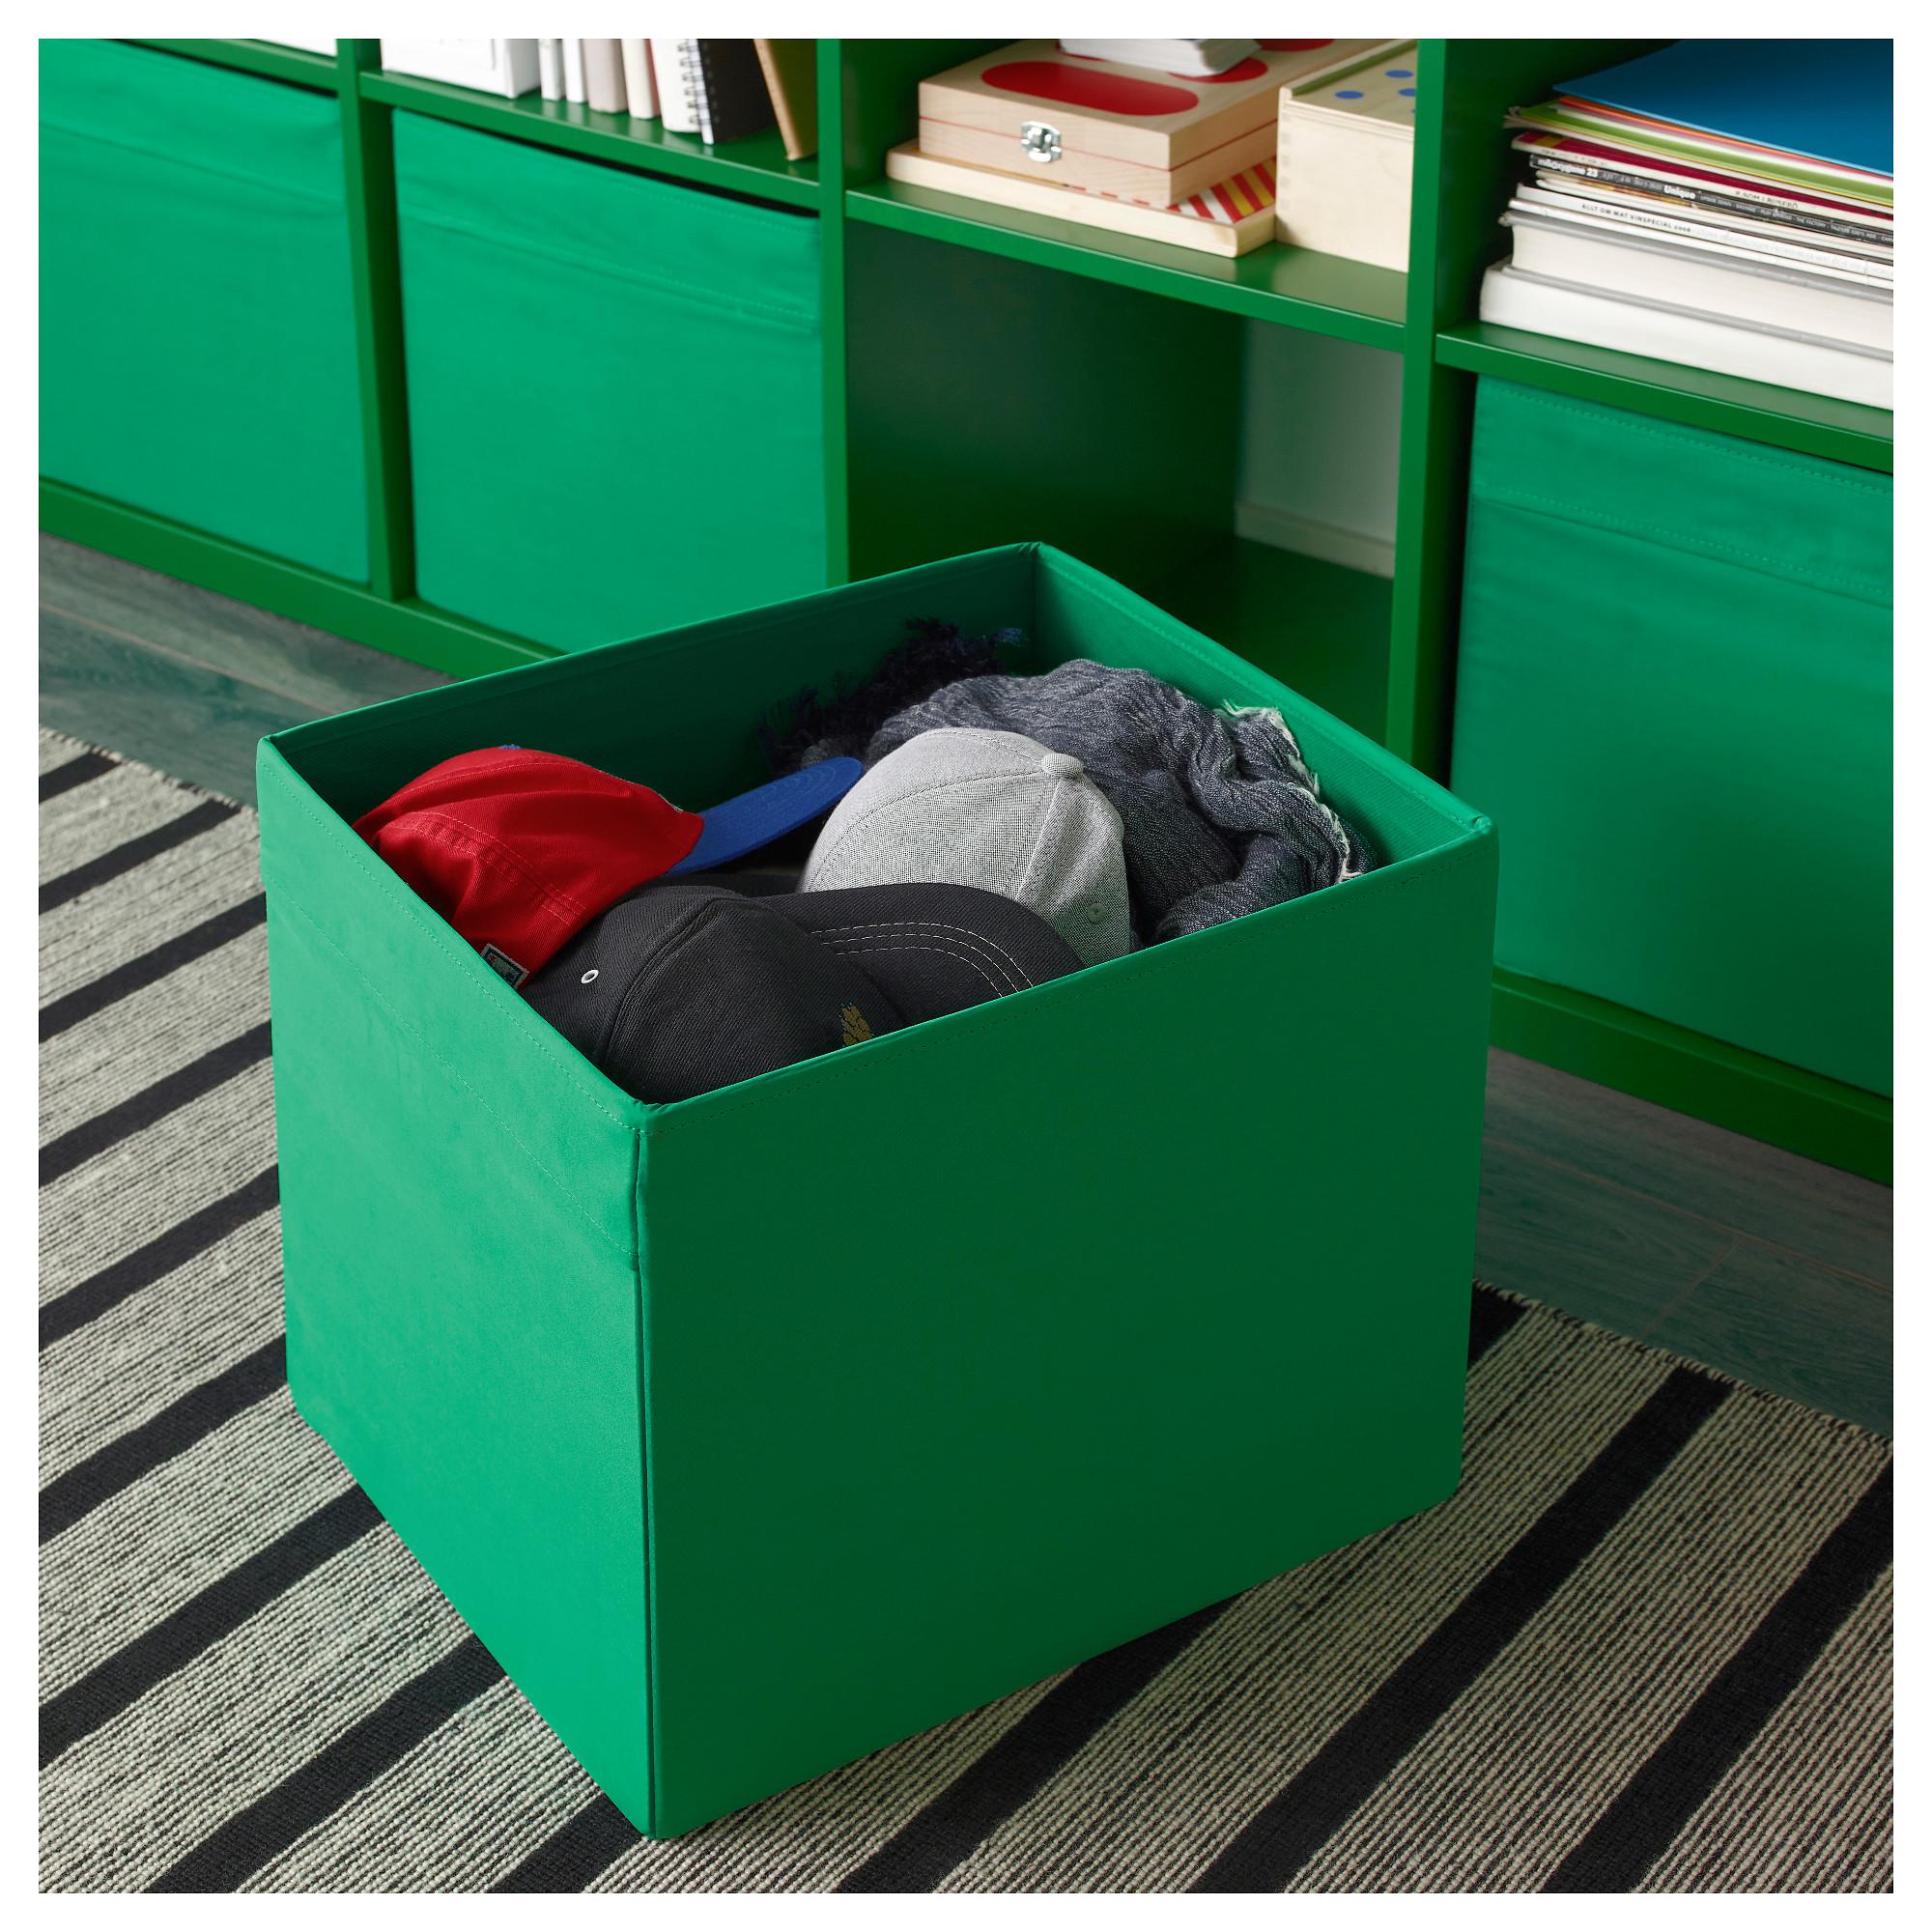 ikea dr na gr n fach box expedit kallax regal aufbewahrungsbox kiste 4 st ck ebay. Black Bedroom Furniture Sets. Home Design Ideas